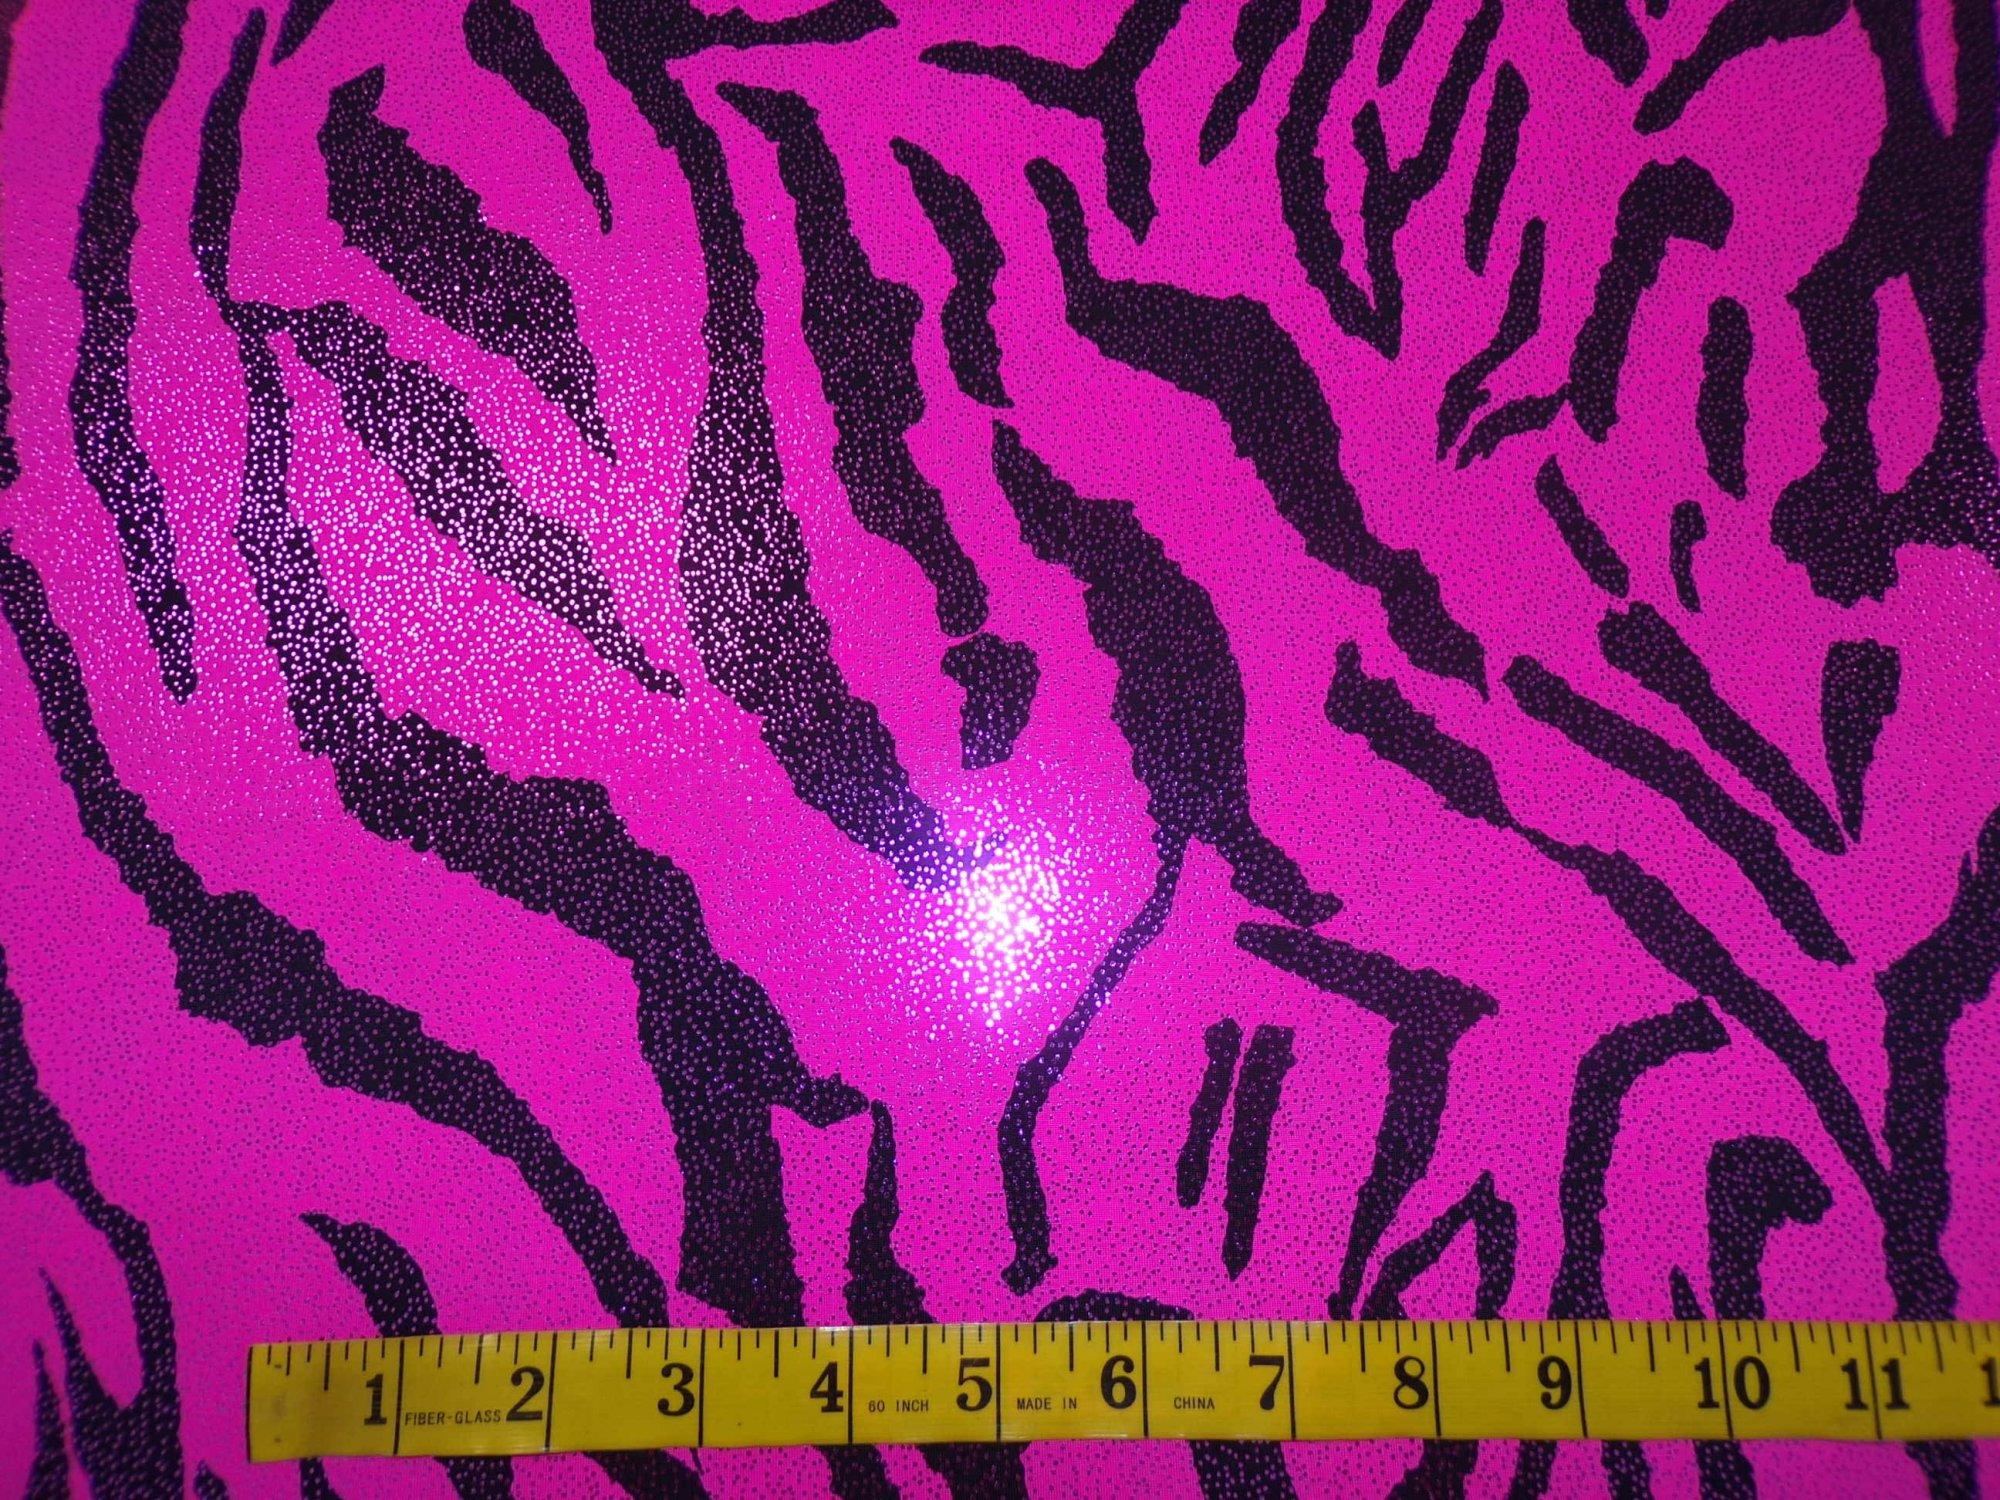 ITY Jersey - Hot Pink and Black Zebra Stripes